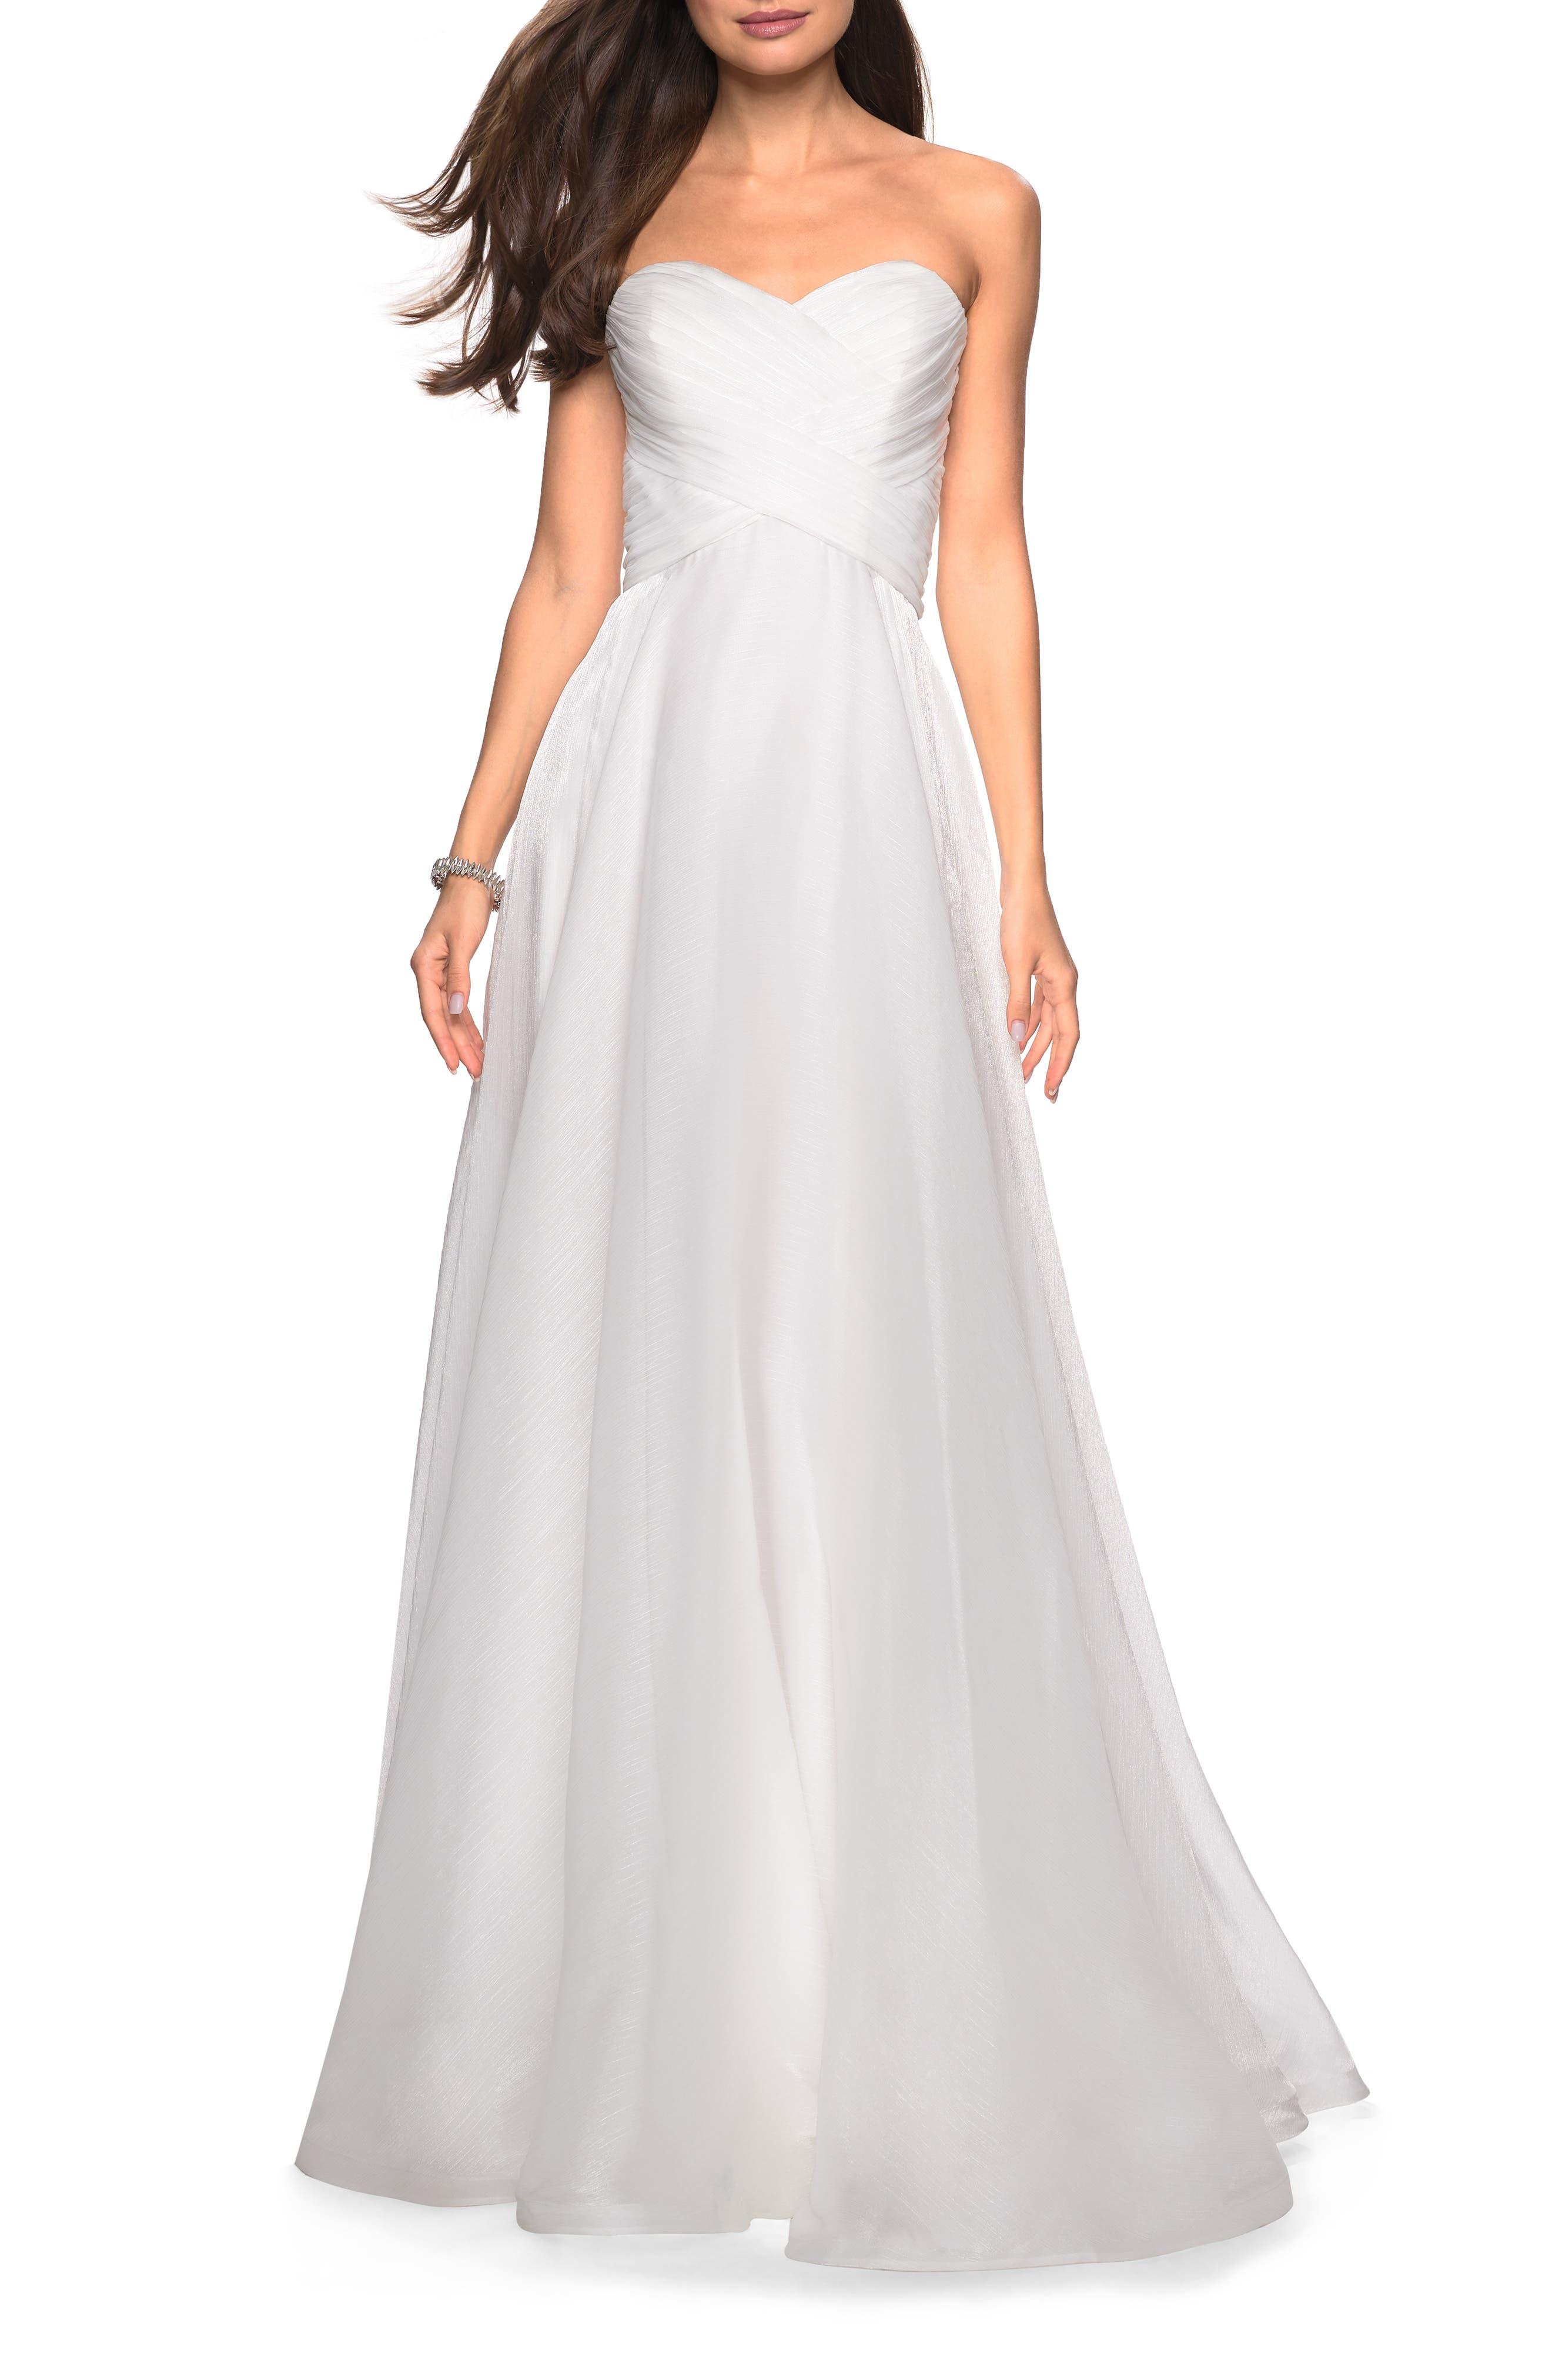 LA FEMME Strapless Metallic Chiffon Evening Dress, Main, color, WHITE